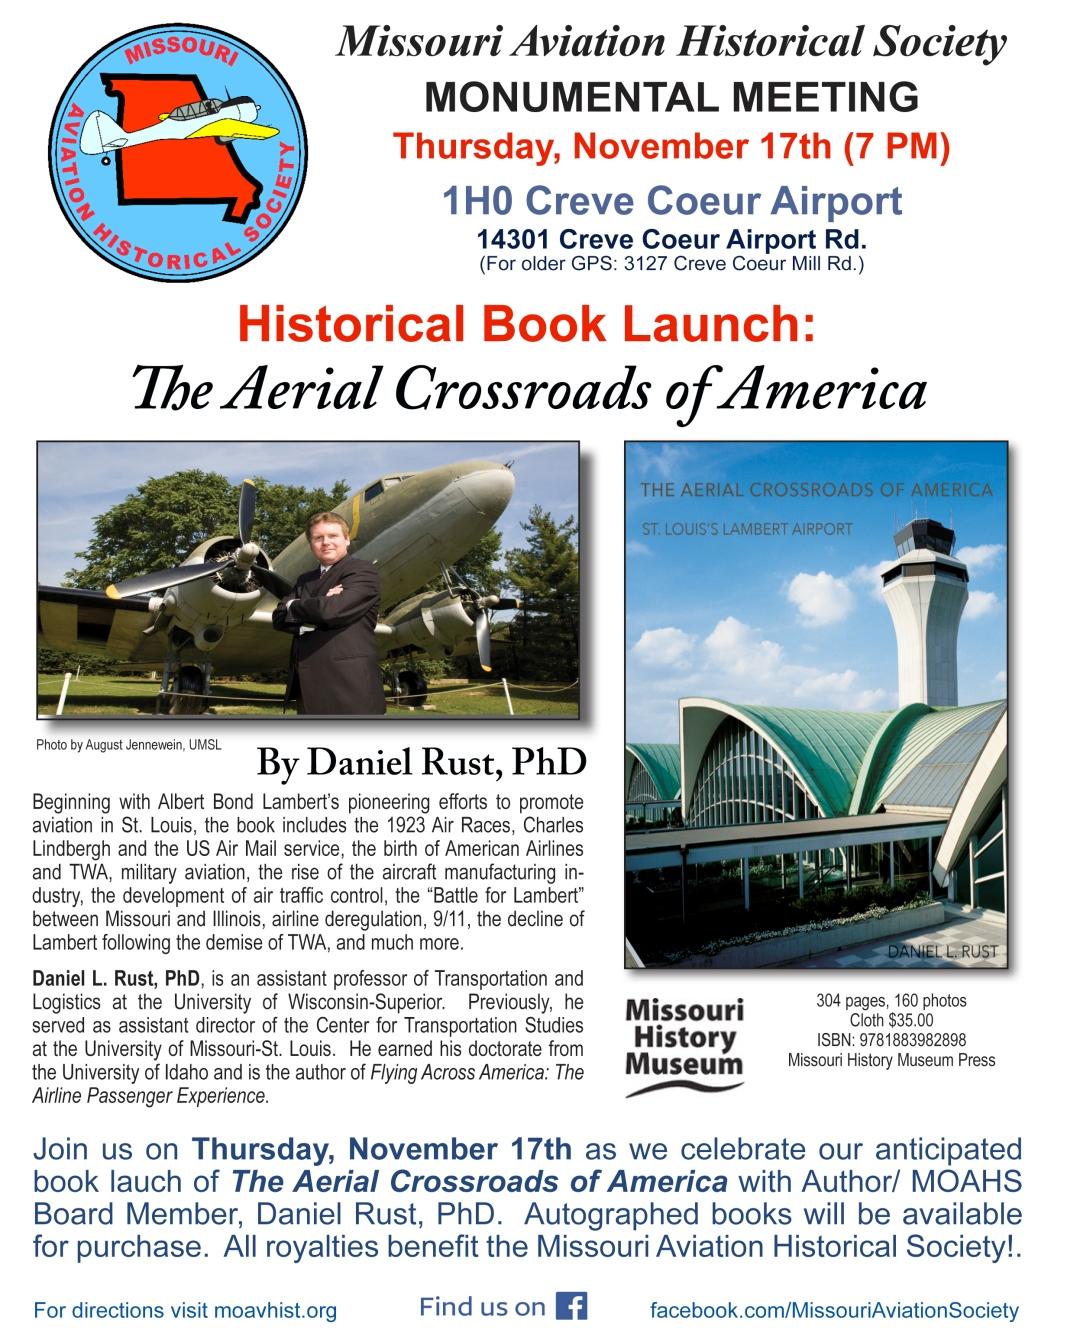 v2-2016-11-17-moahs-book-launch-meeting-flyer